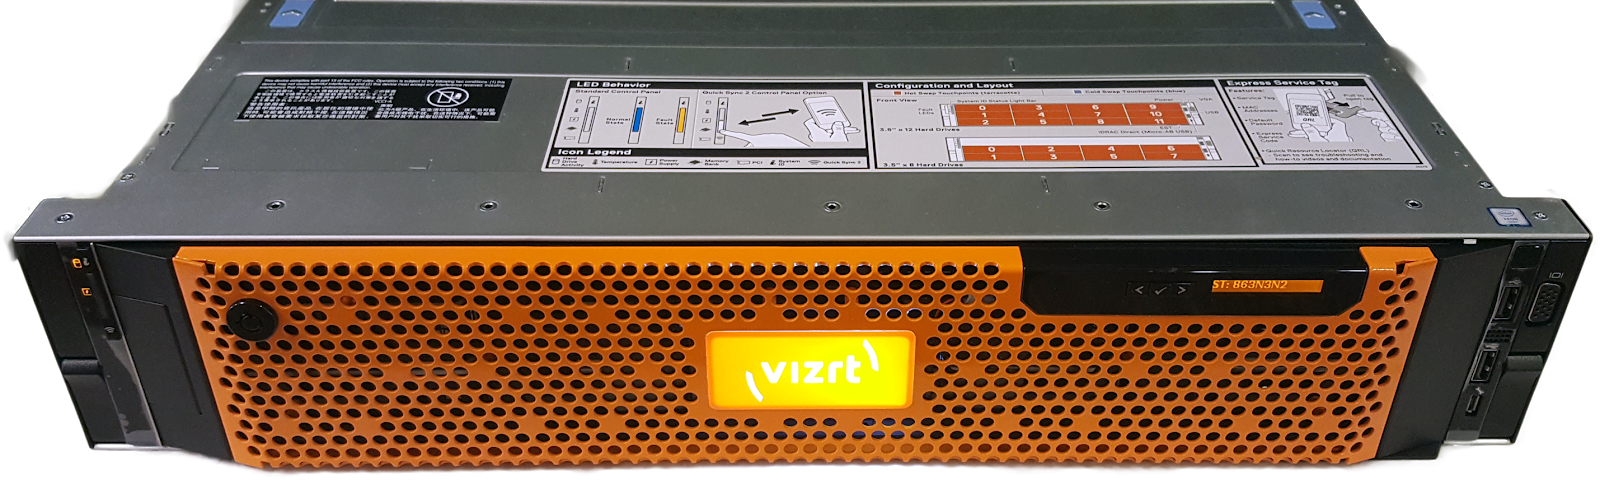 Dell R7920 - Viz Artist and Engine